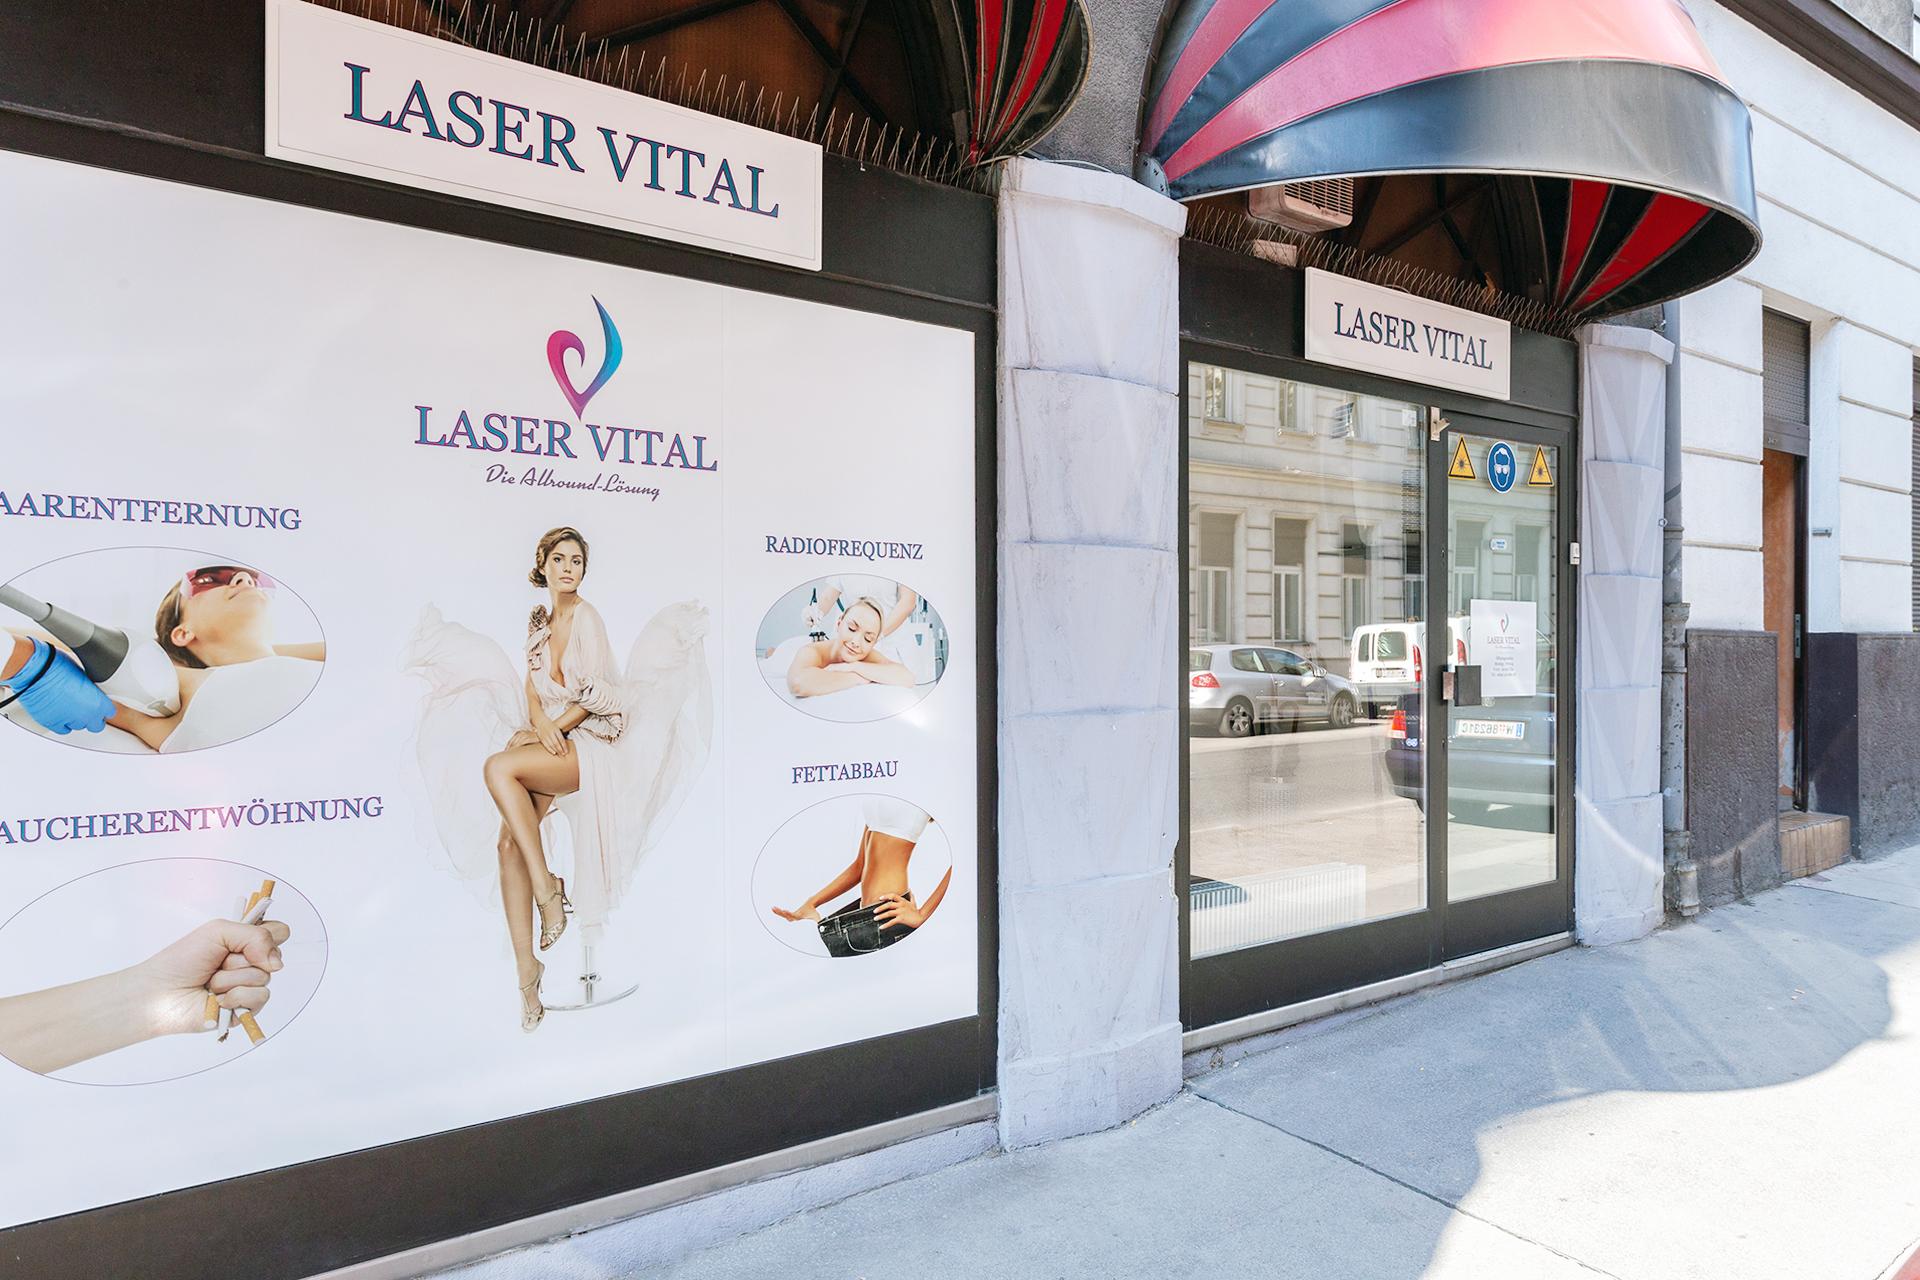 Laser_Vital_Neustiftgasse_AIA_299798_13.